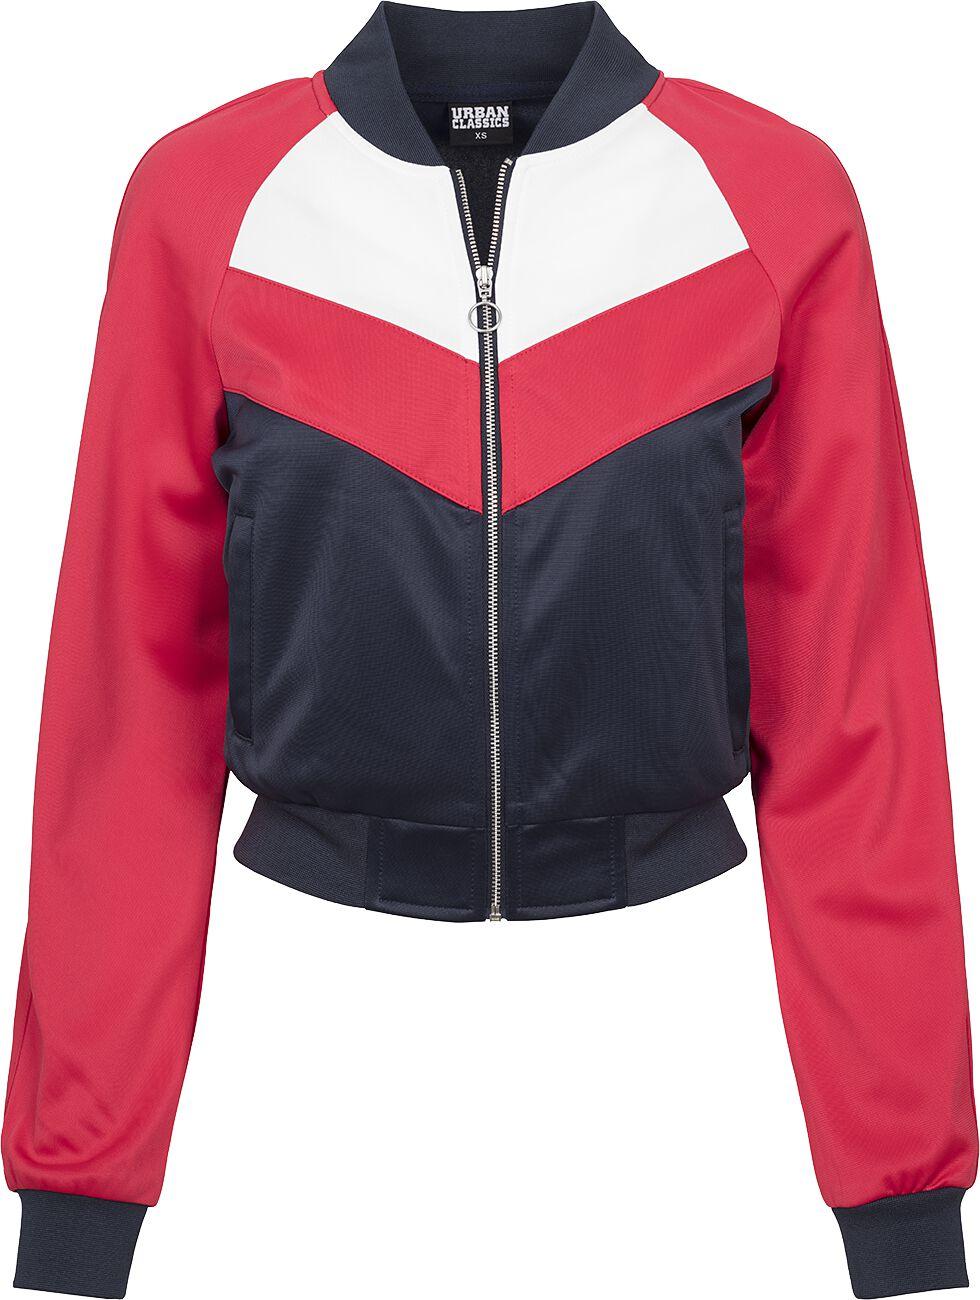 Marki - Kurtki - Kurtka treningowa damska Urban Classics Ladies Short Raglan Track Jacket Kurtka treningowa damska granatowy/czerwony - 363300